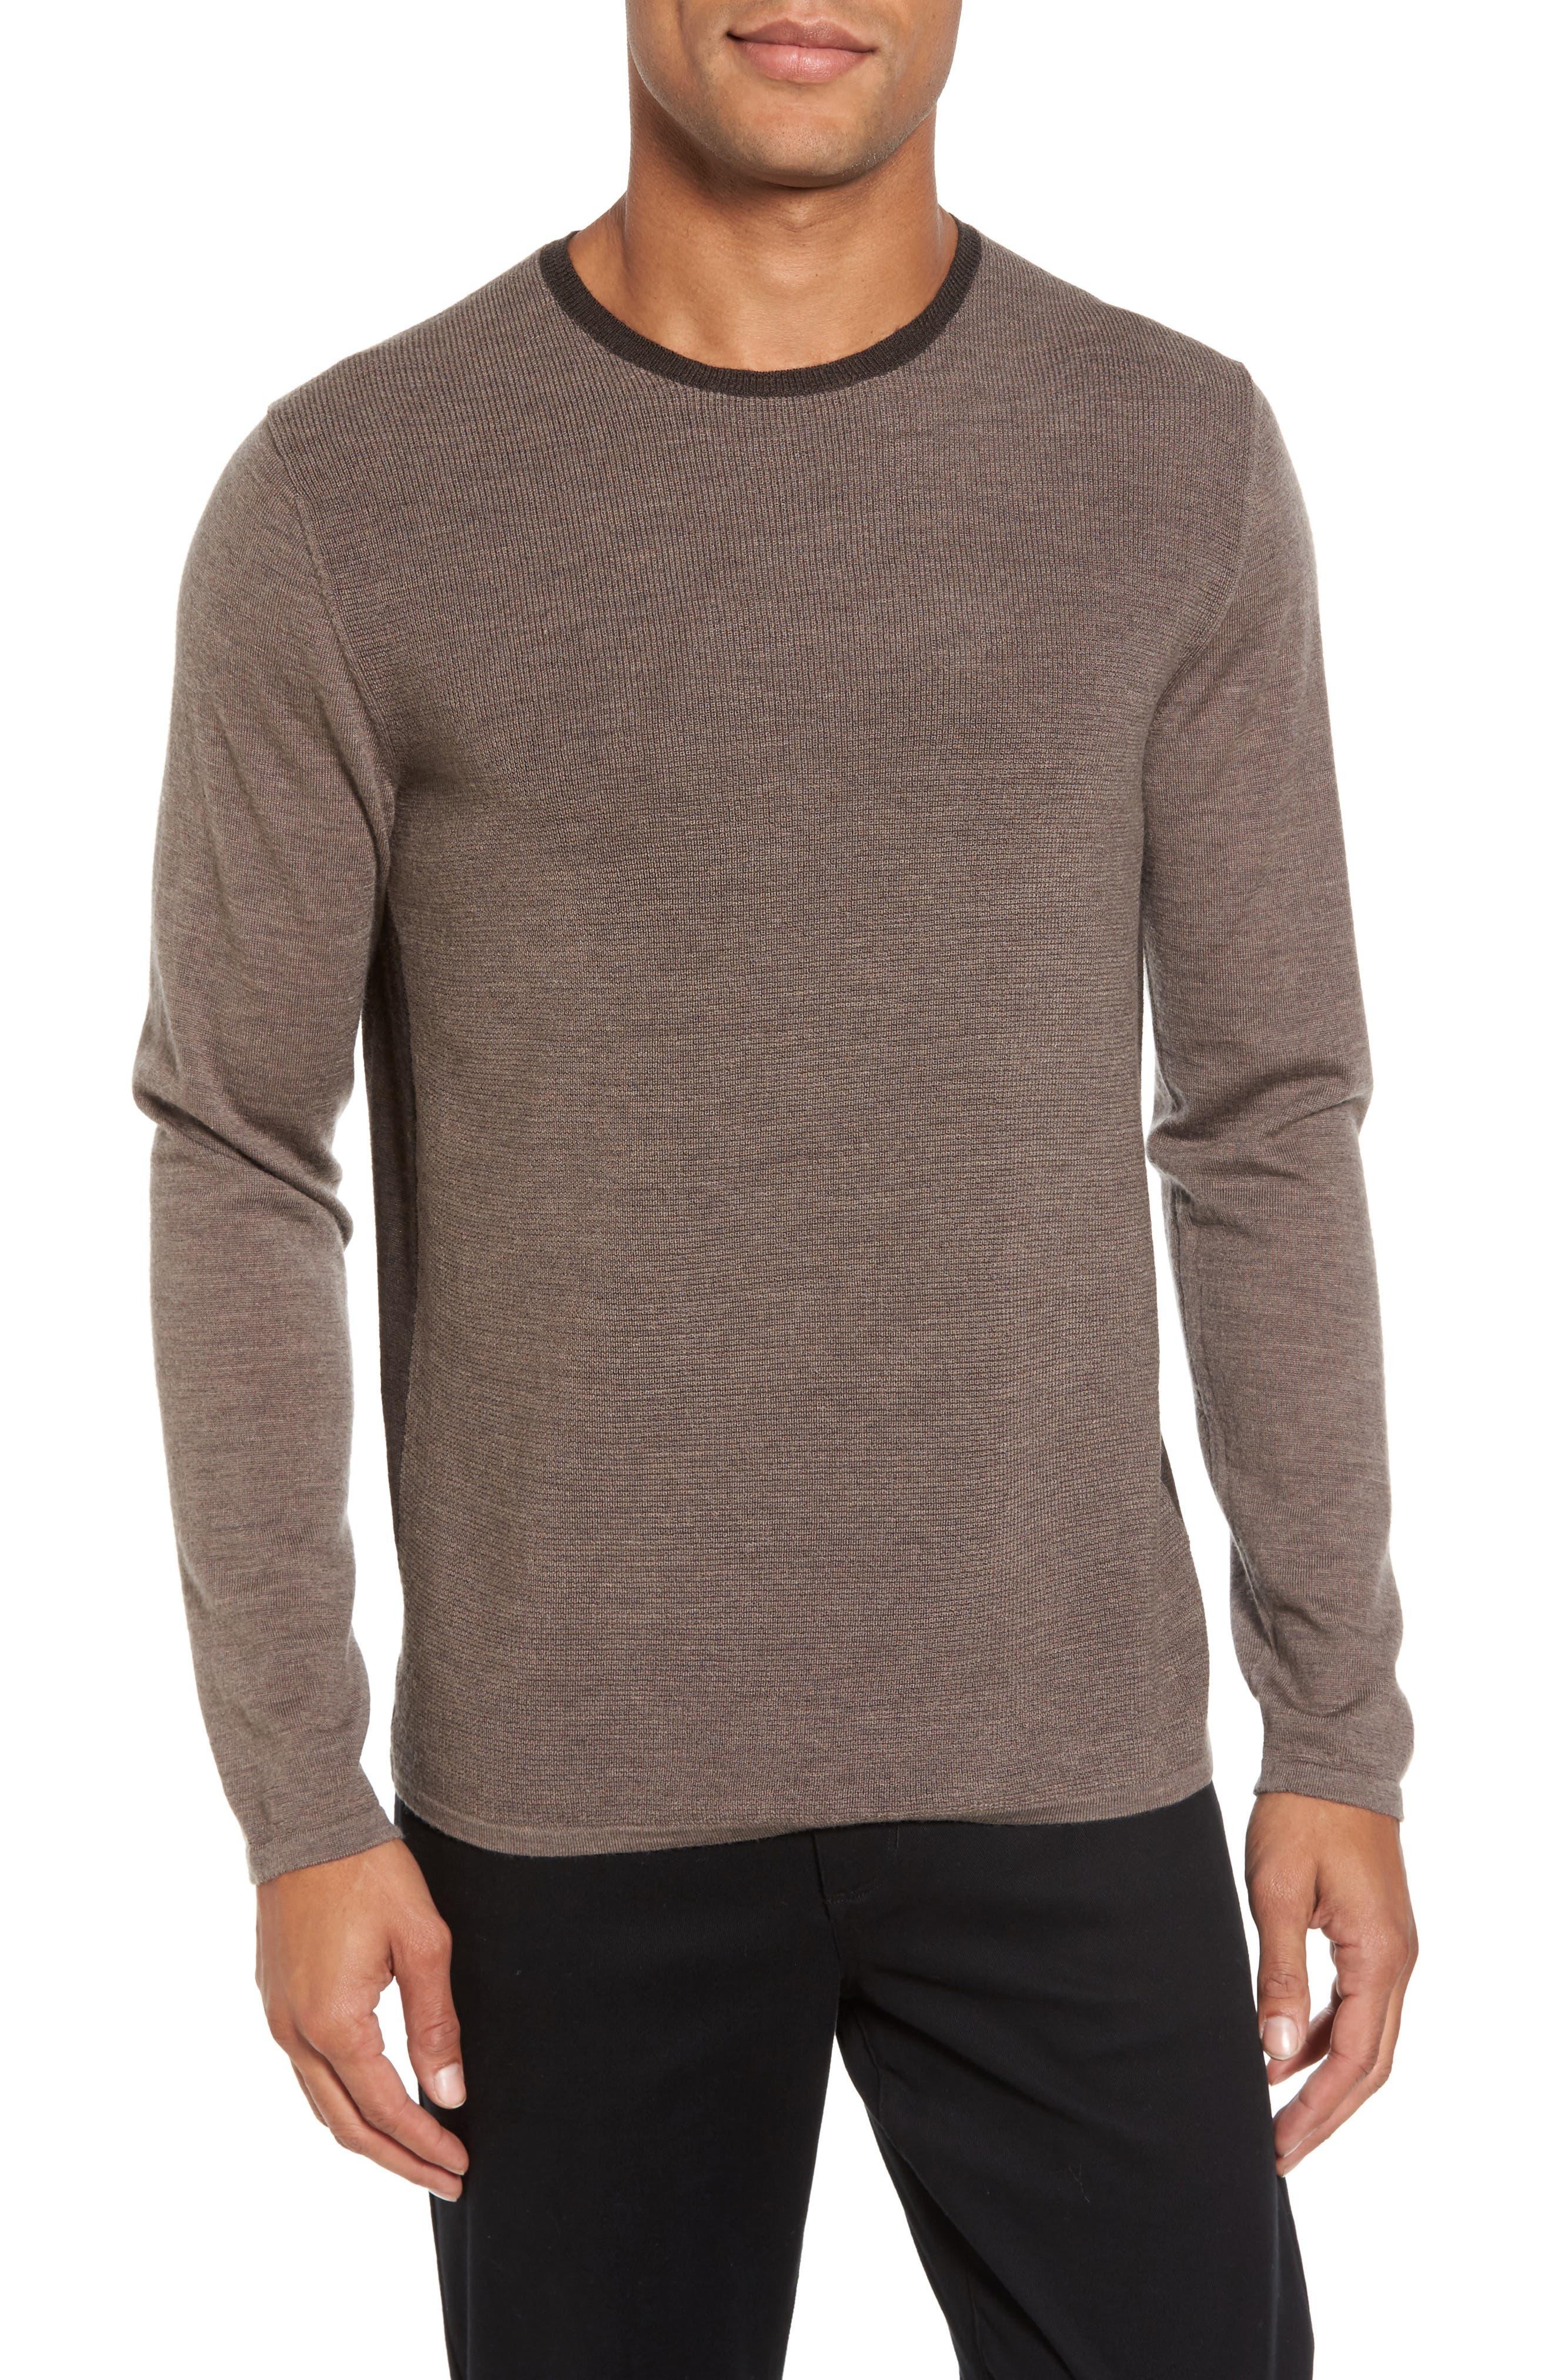 Huxley Merino Sweater,                         Main,                         color, Light Coffee